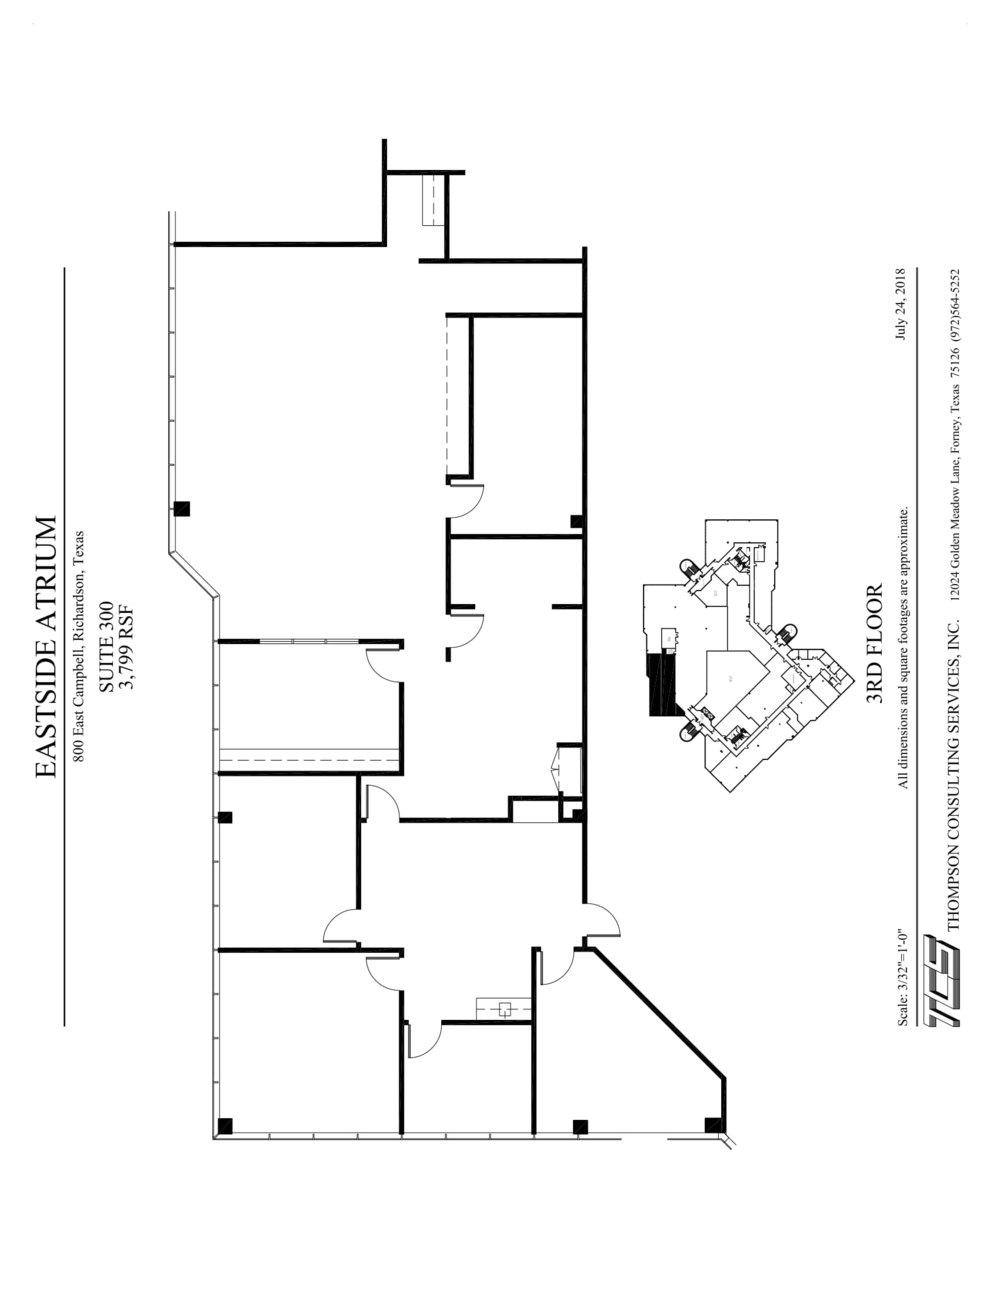 Eastside Atrium - Suite 300 - Marketing Plan-1